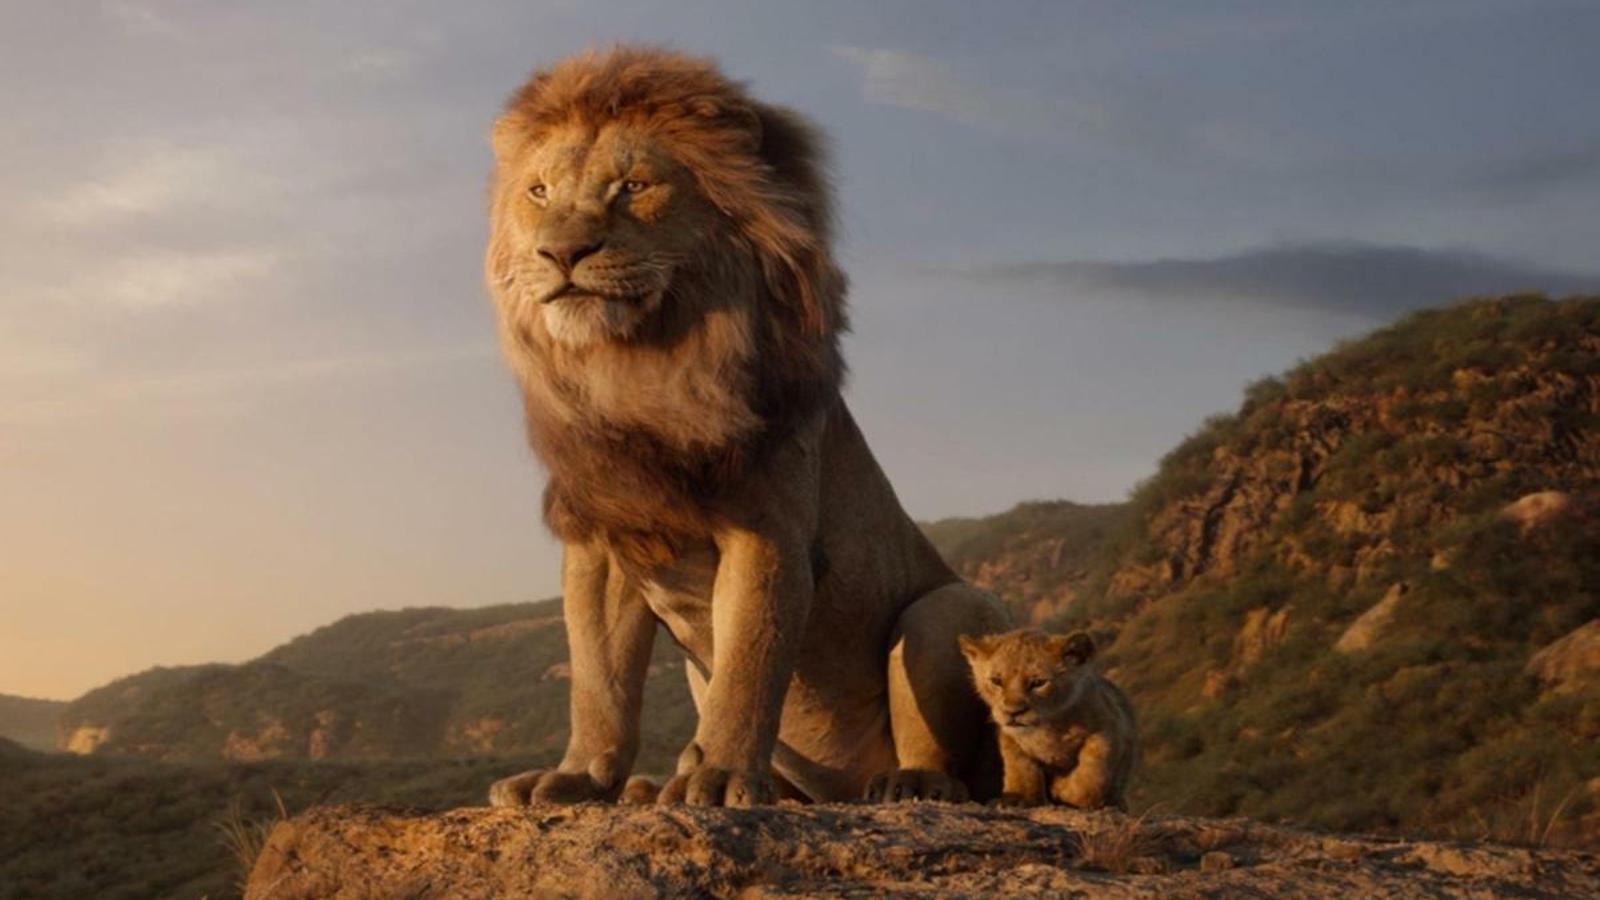 'El rey león', una adaptació hiperrealista i freda